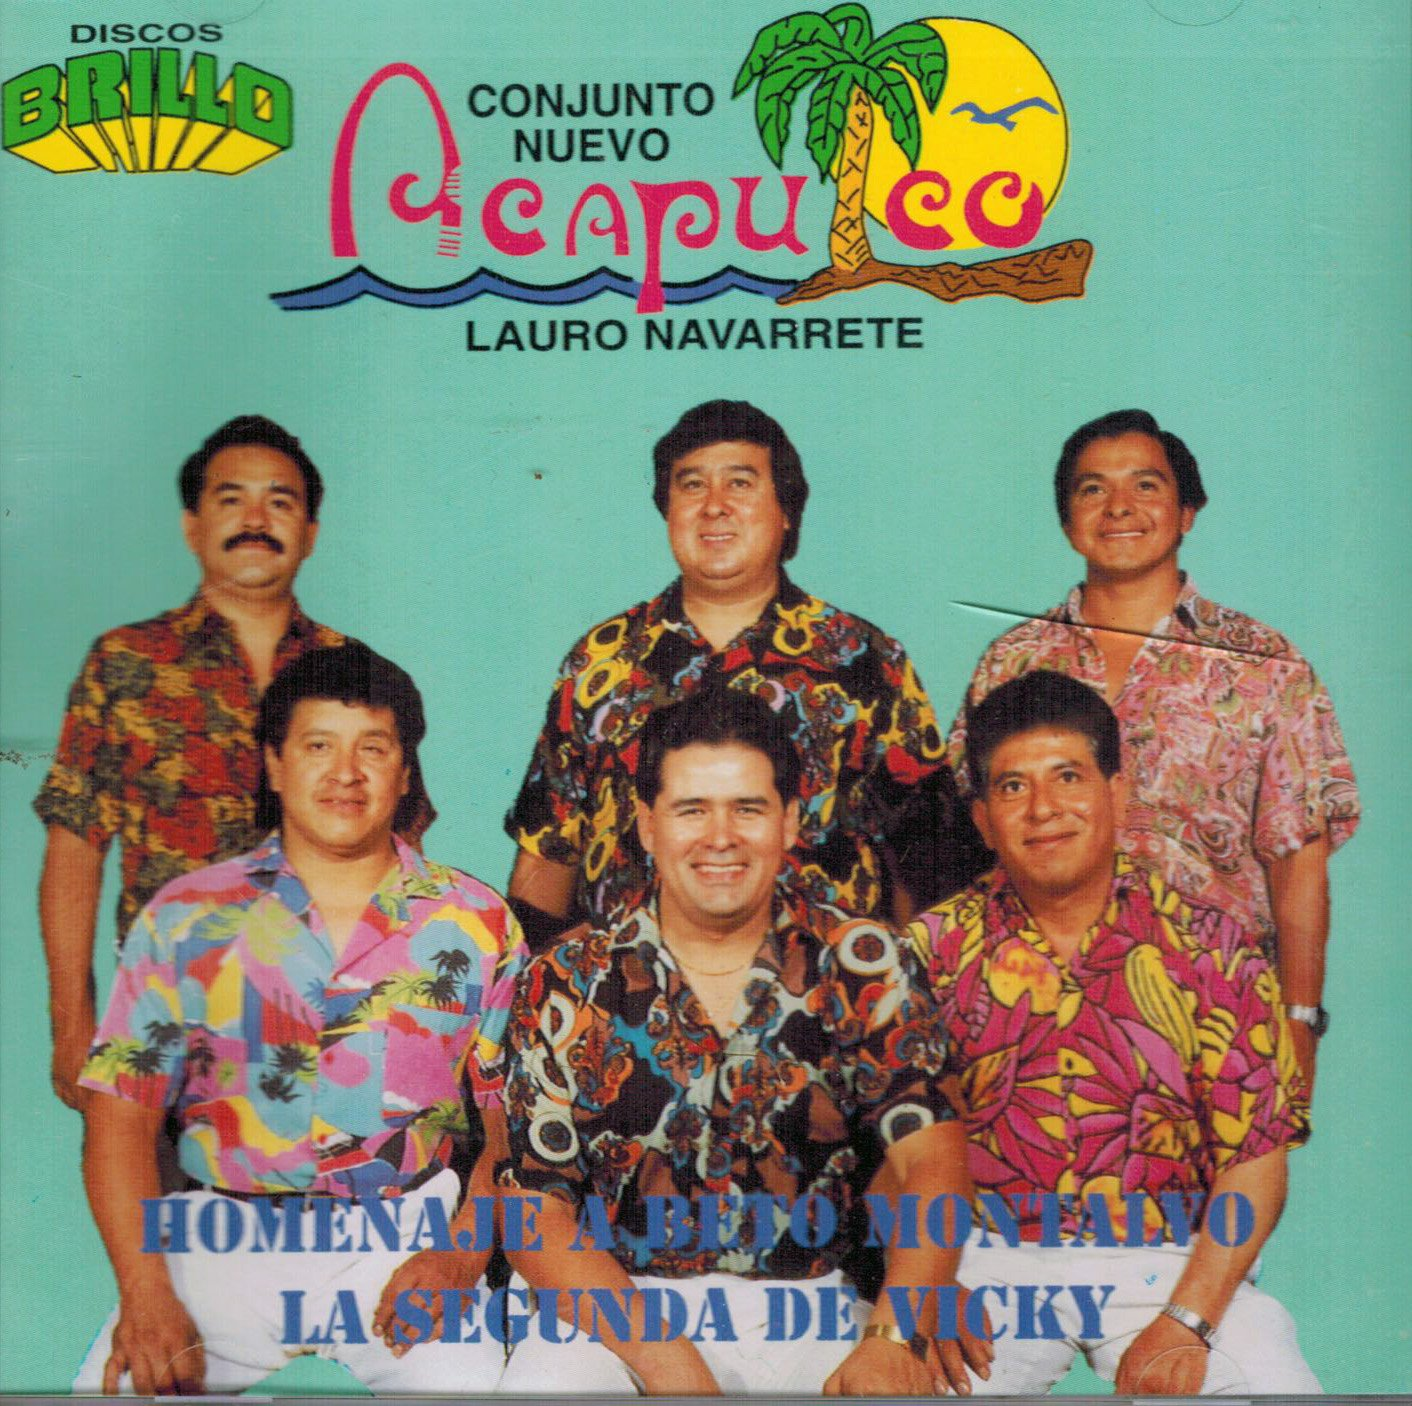 Conjunto Nuevo Acapulco Tropical Ranking TOP10 Montalvo Beto a ! Super beauty product restock quality top! Homenaje